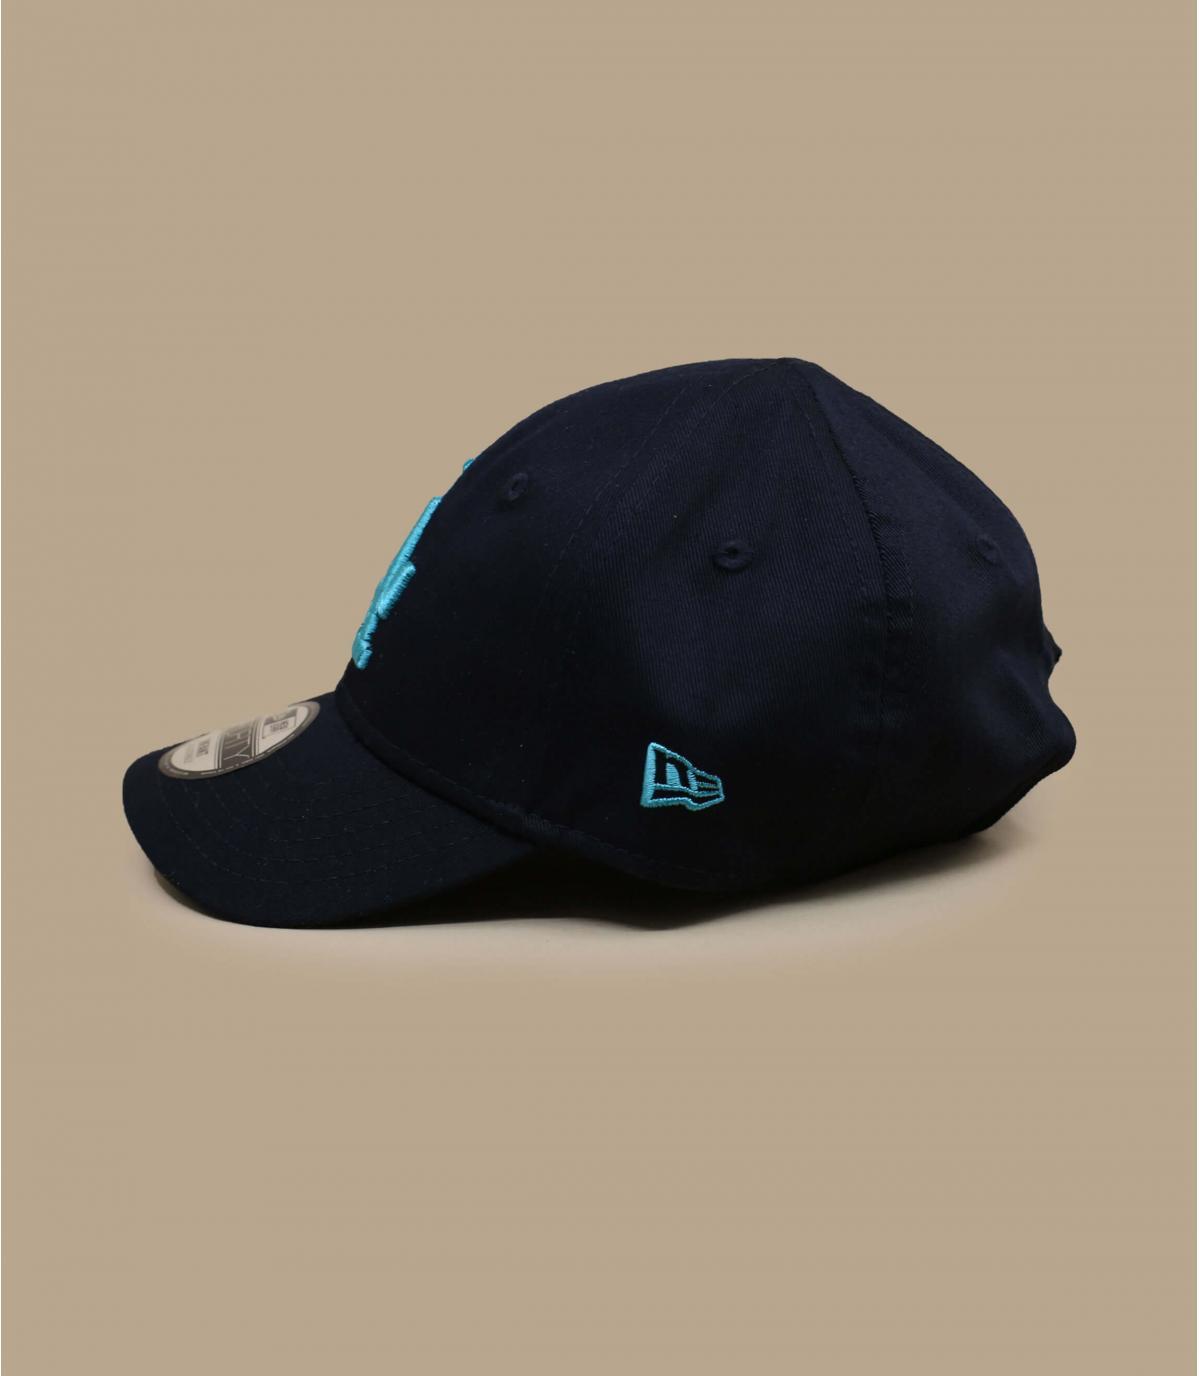 Details Baby Cap League Ess 940 LA navy cyan - Abbildung 2